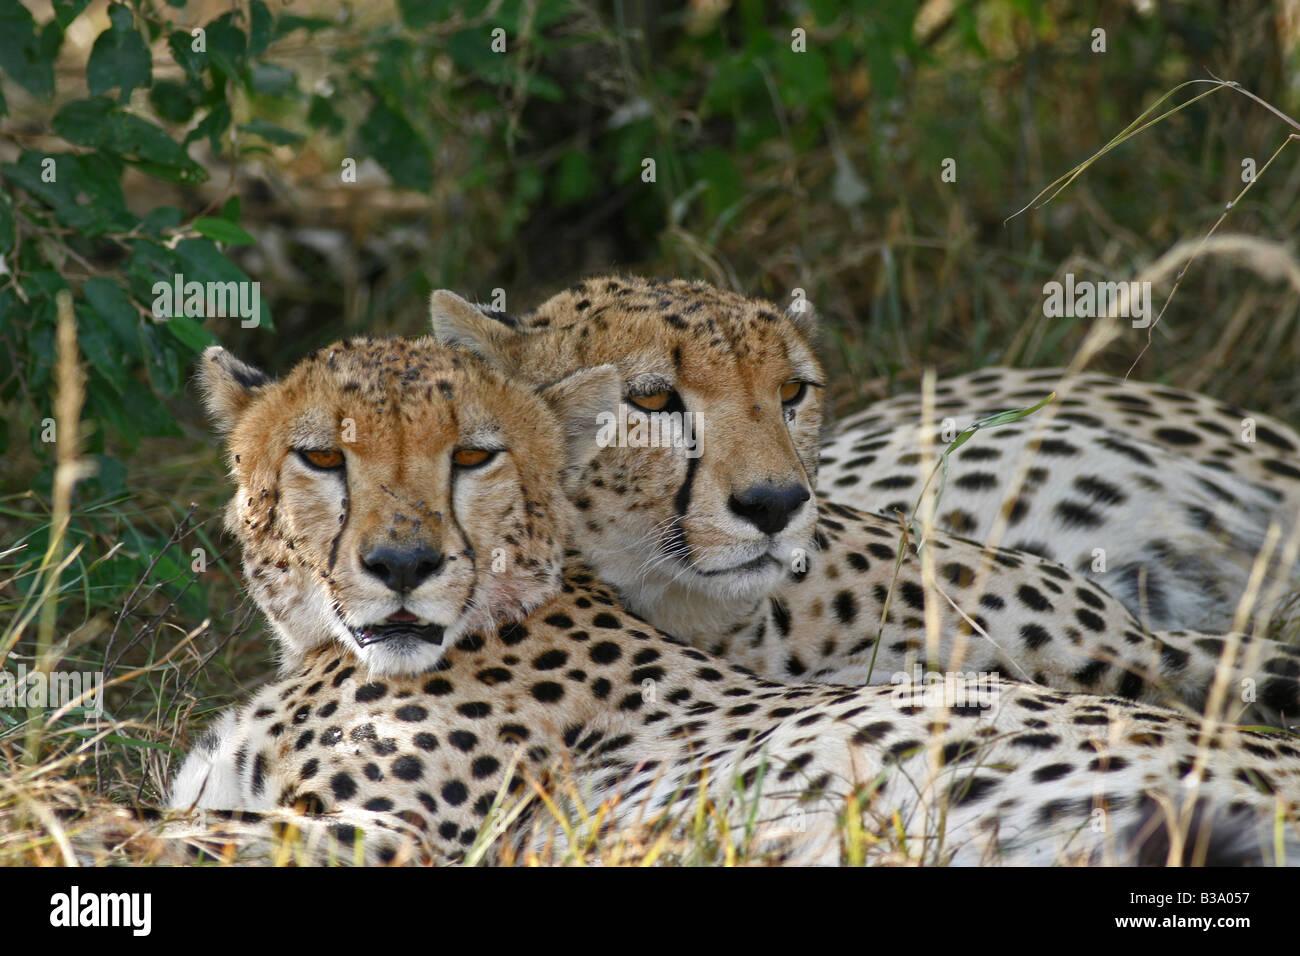 Two Cheetah resting in the shade, Masai Mara, Kenya Stock Photo